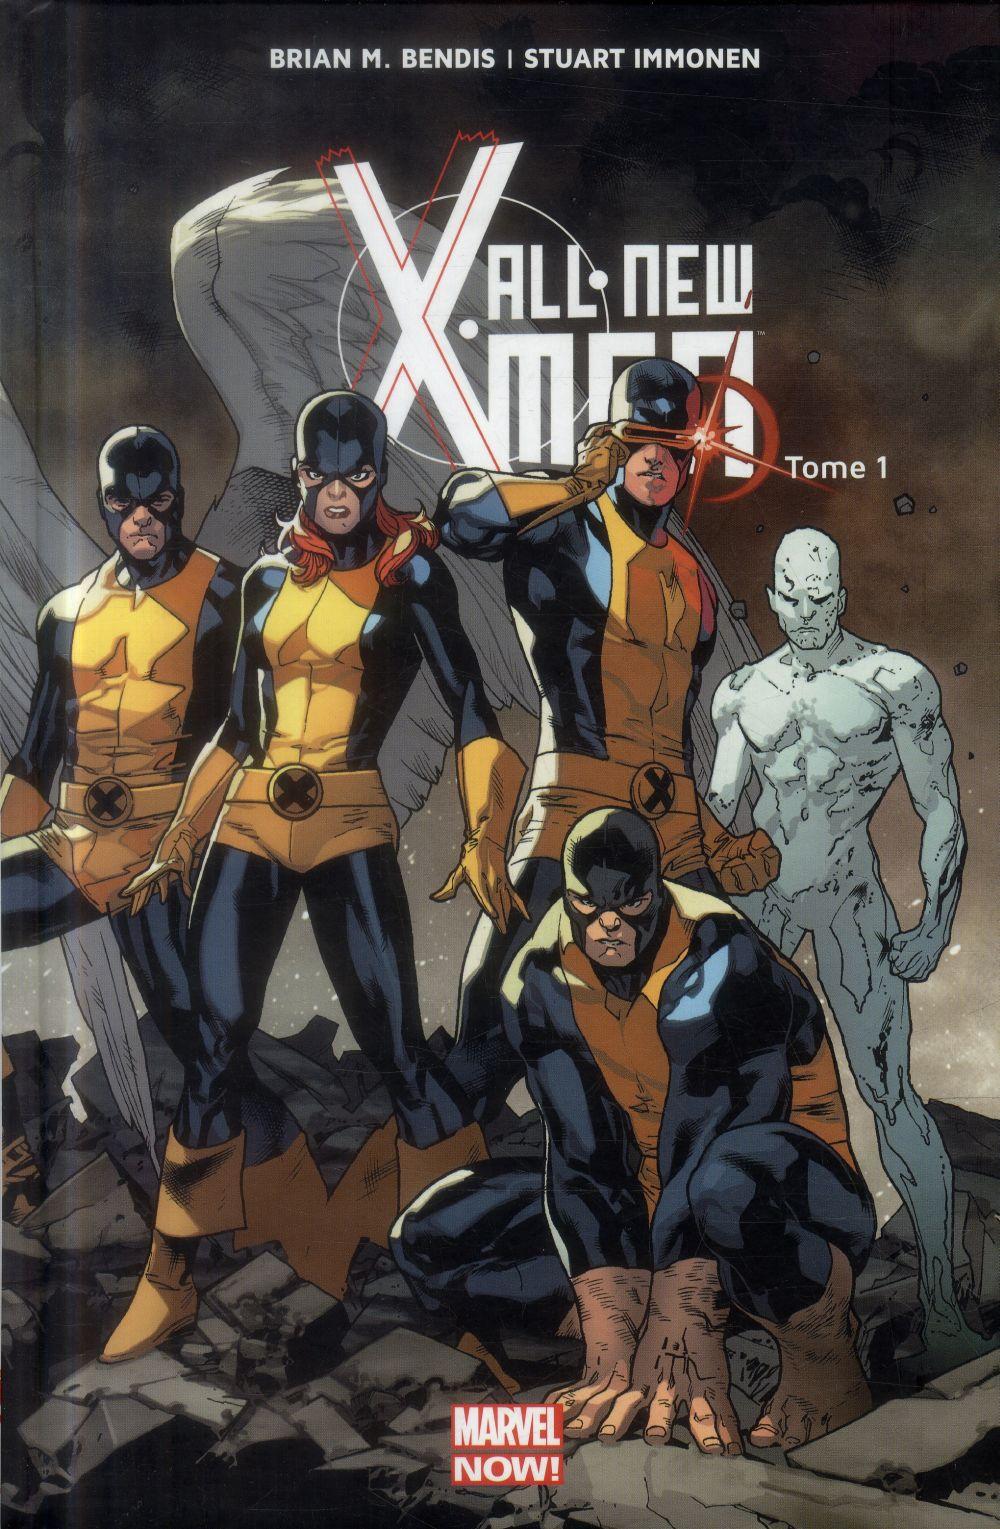 ALL NEW X-MEN T01 Bendis Brian Michael